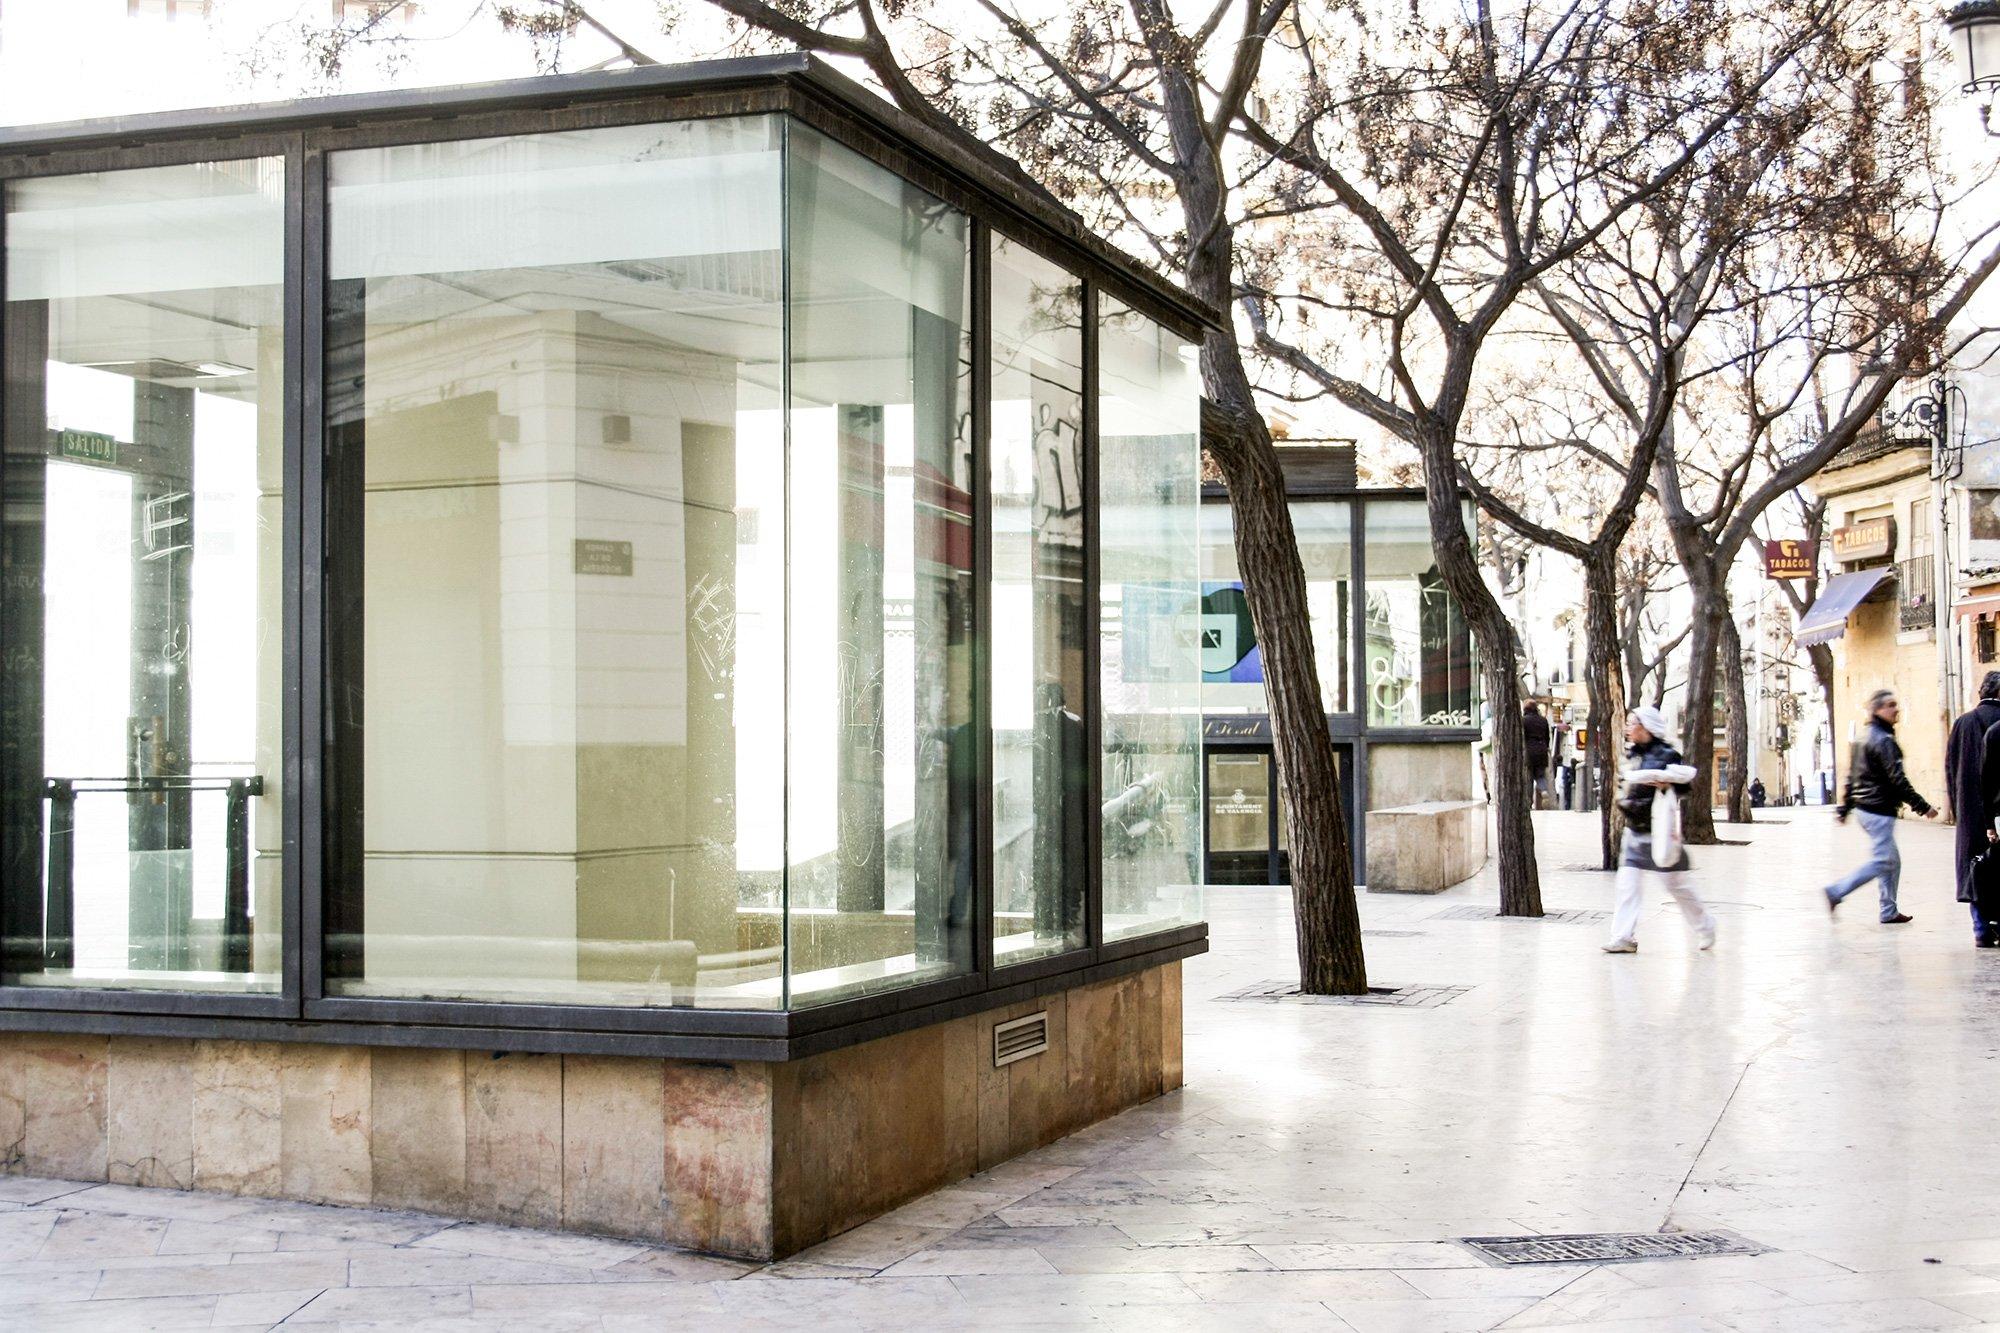 Navarro vicedo arquitectura arquitectos en valencia y - Arquitectos en valencia ...